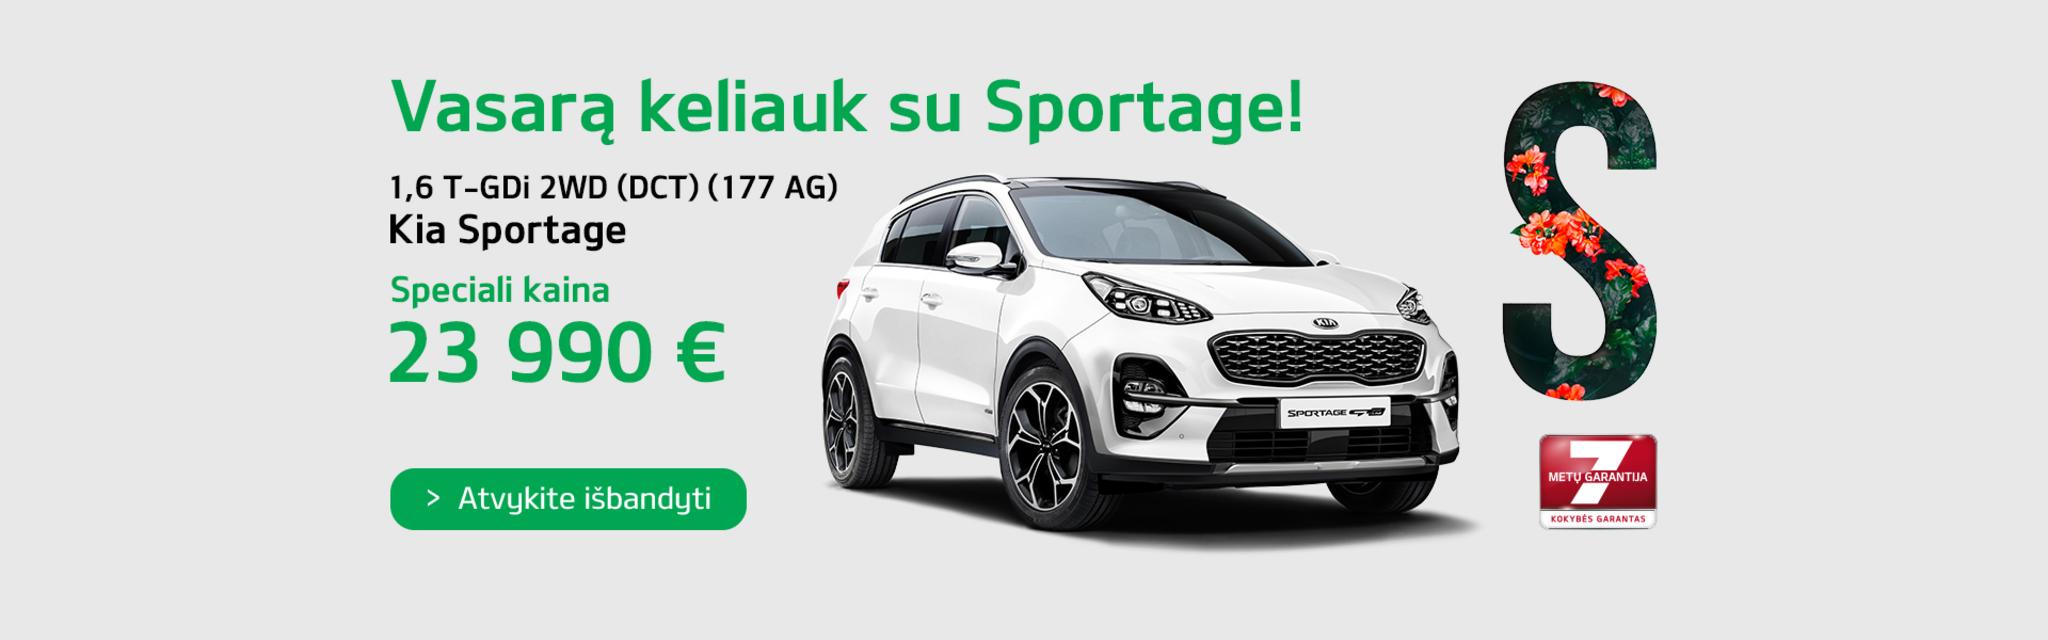 Kia Sportage Summer offer